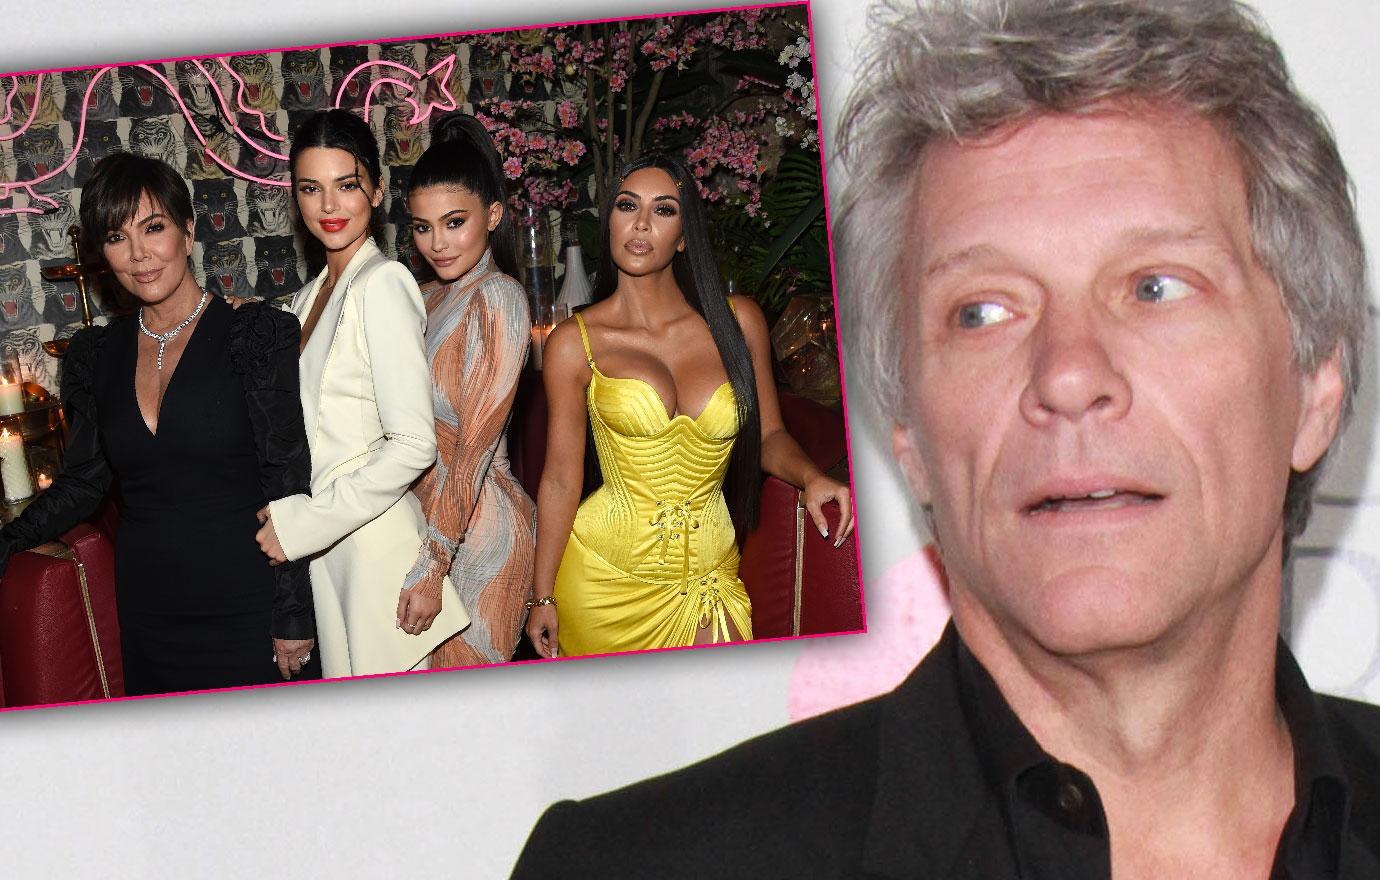 Jon Bon Jovi Slams Kardashians And Housewives